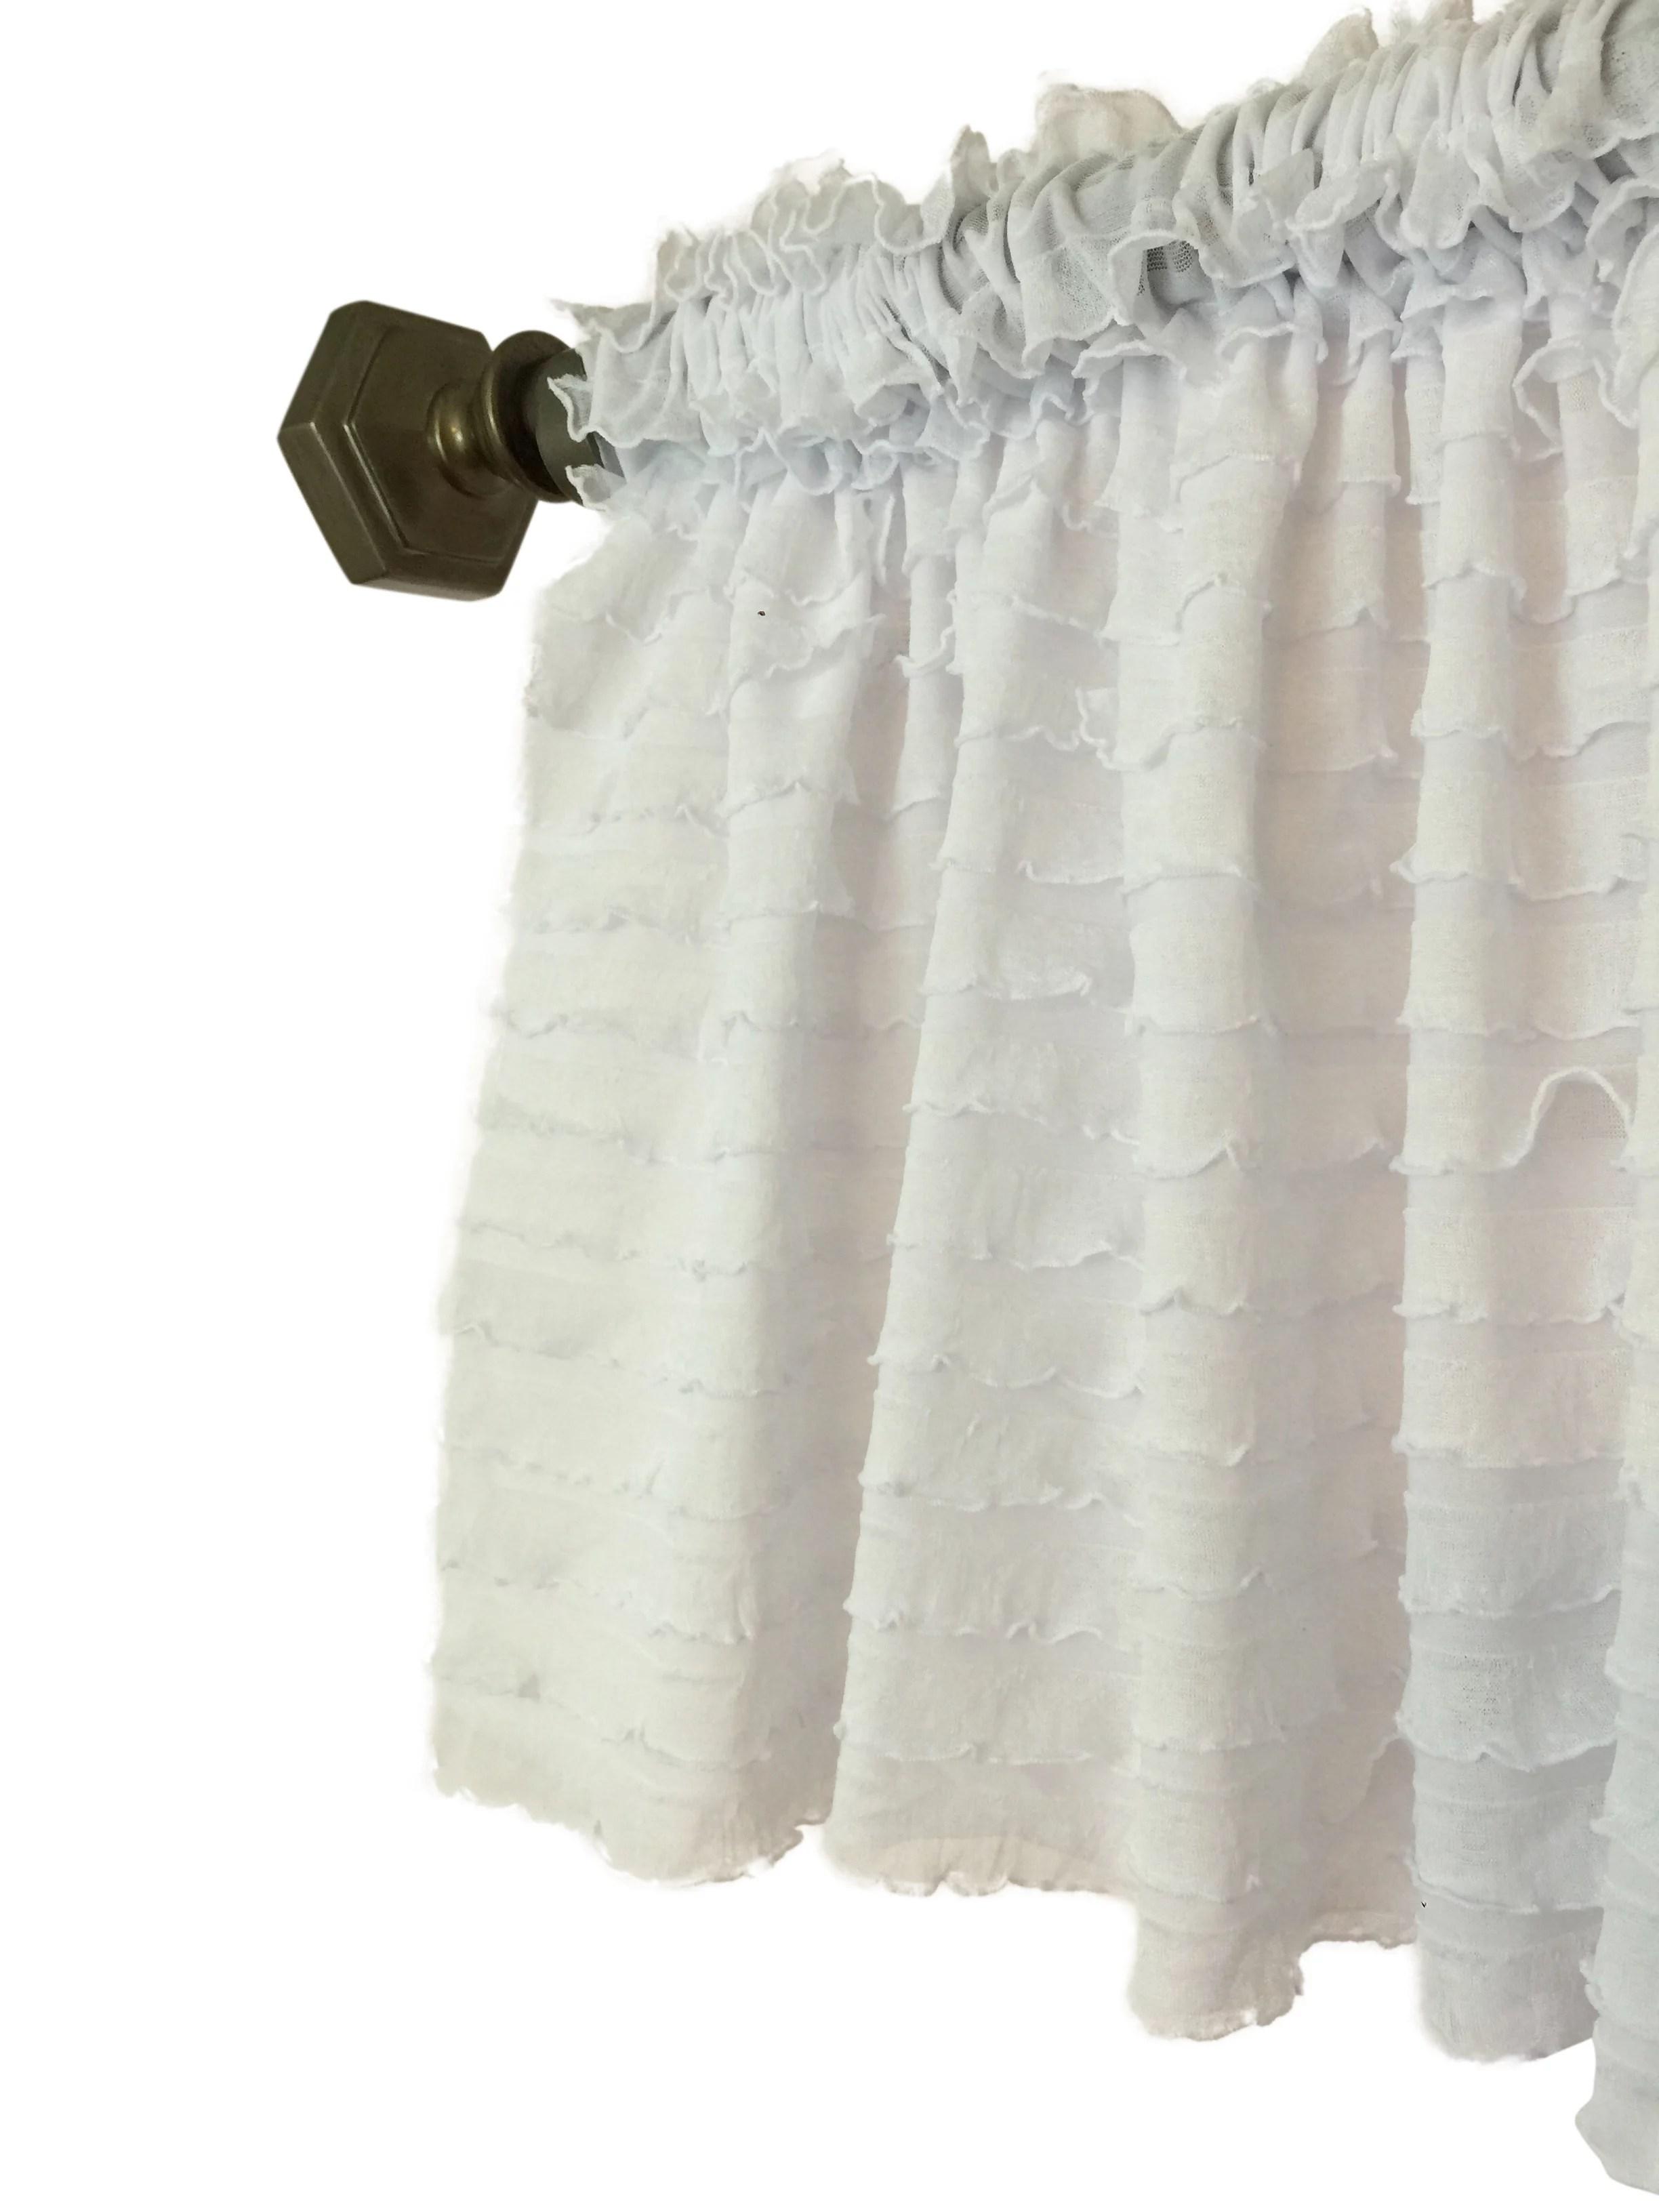 white ruffle valance sheer curtain window treatment for home decor kitchen nursery office bedroom walmart com